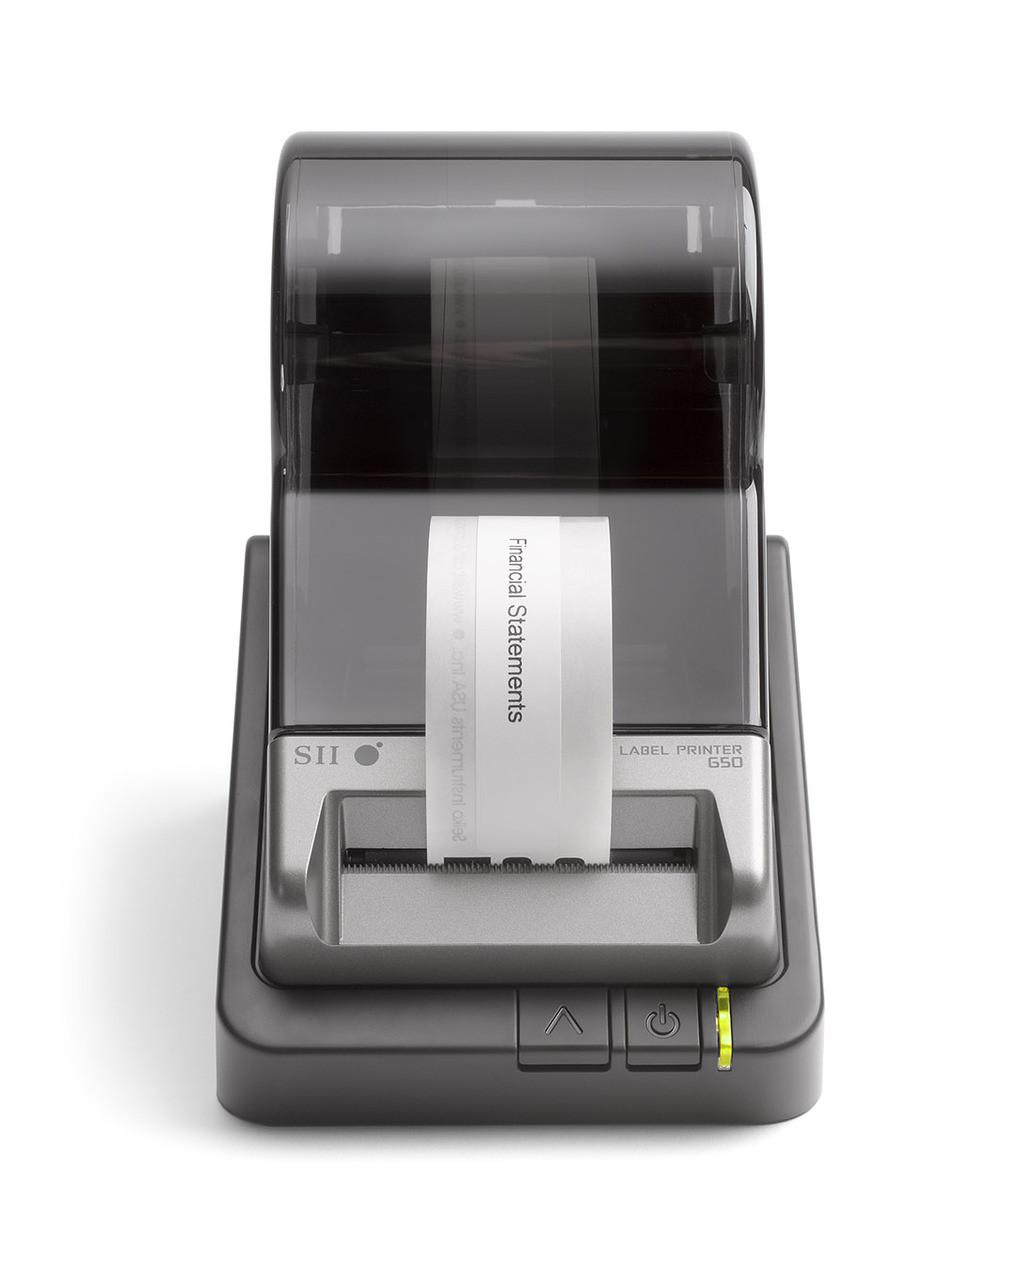 Seiko SLP 650 label printer printing an address label